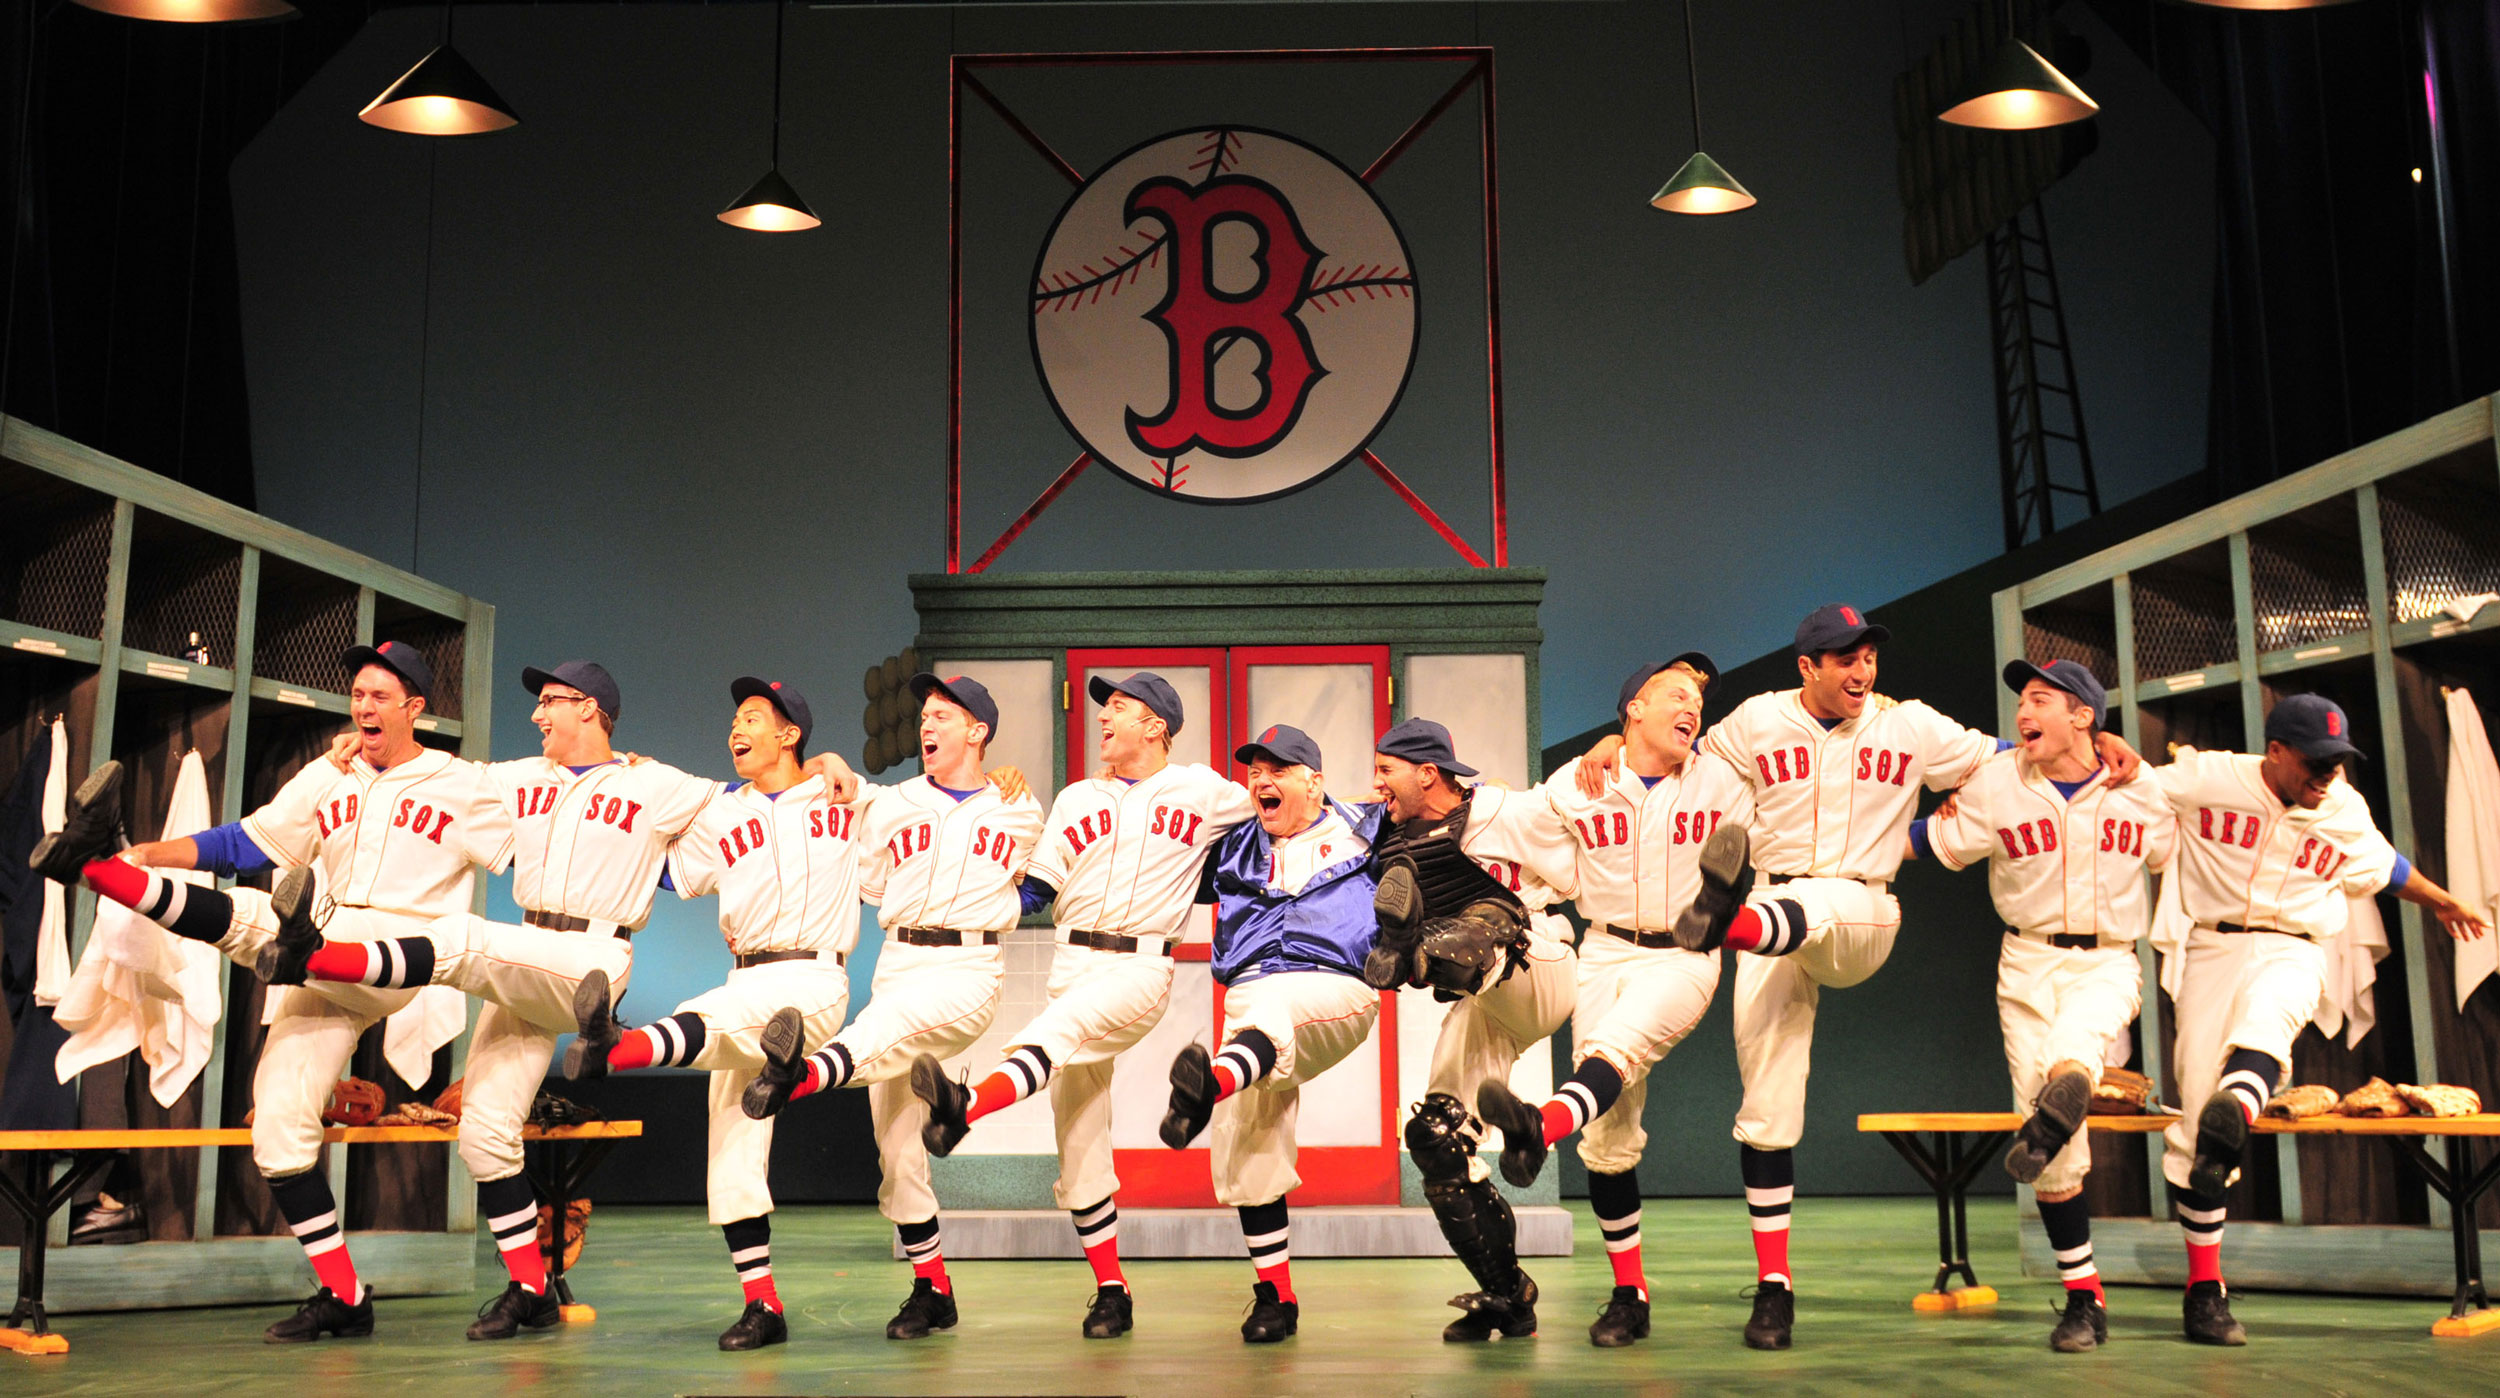 2012_OP_Damn-Yankees_Red-Sox-Team-Dance_RGB_copy.jpg